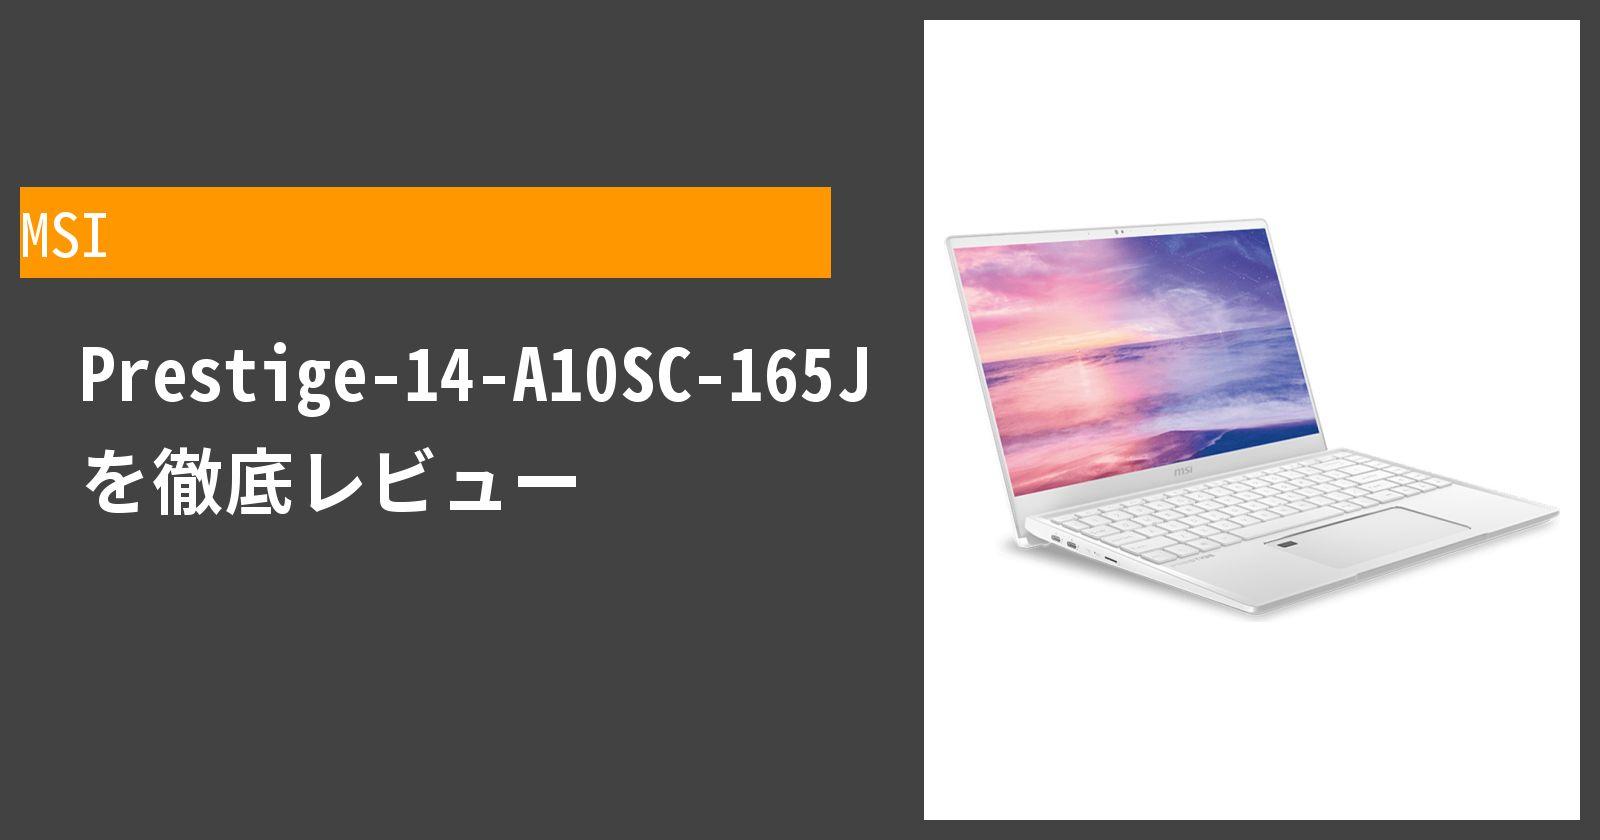 Prestige-14-A10SC-165JPを徹底評価